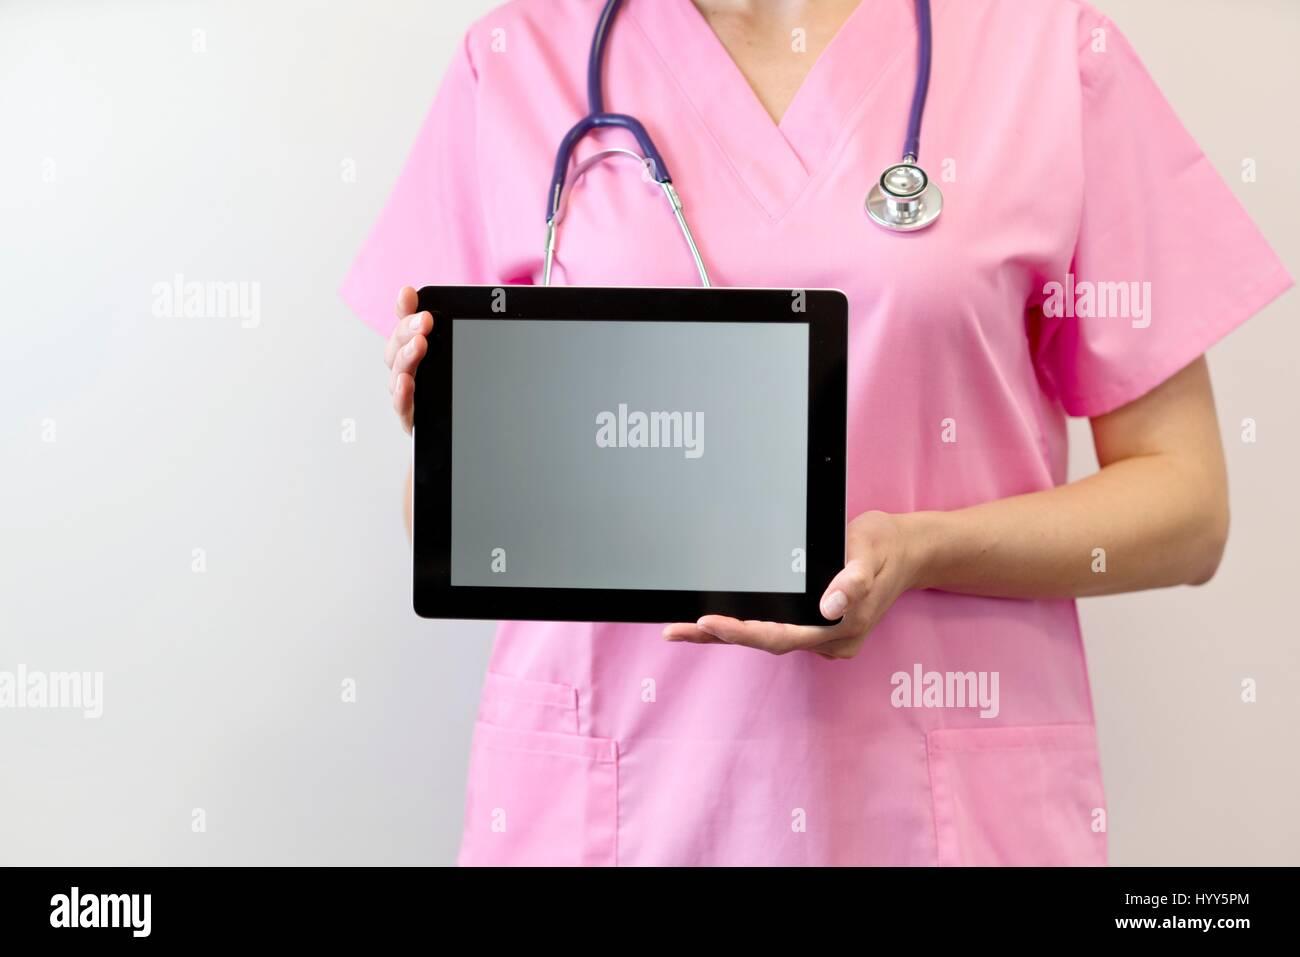 Female nurse holding digital tablet. - Stock Image